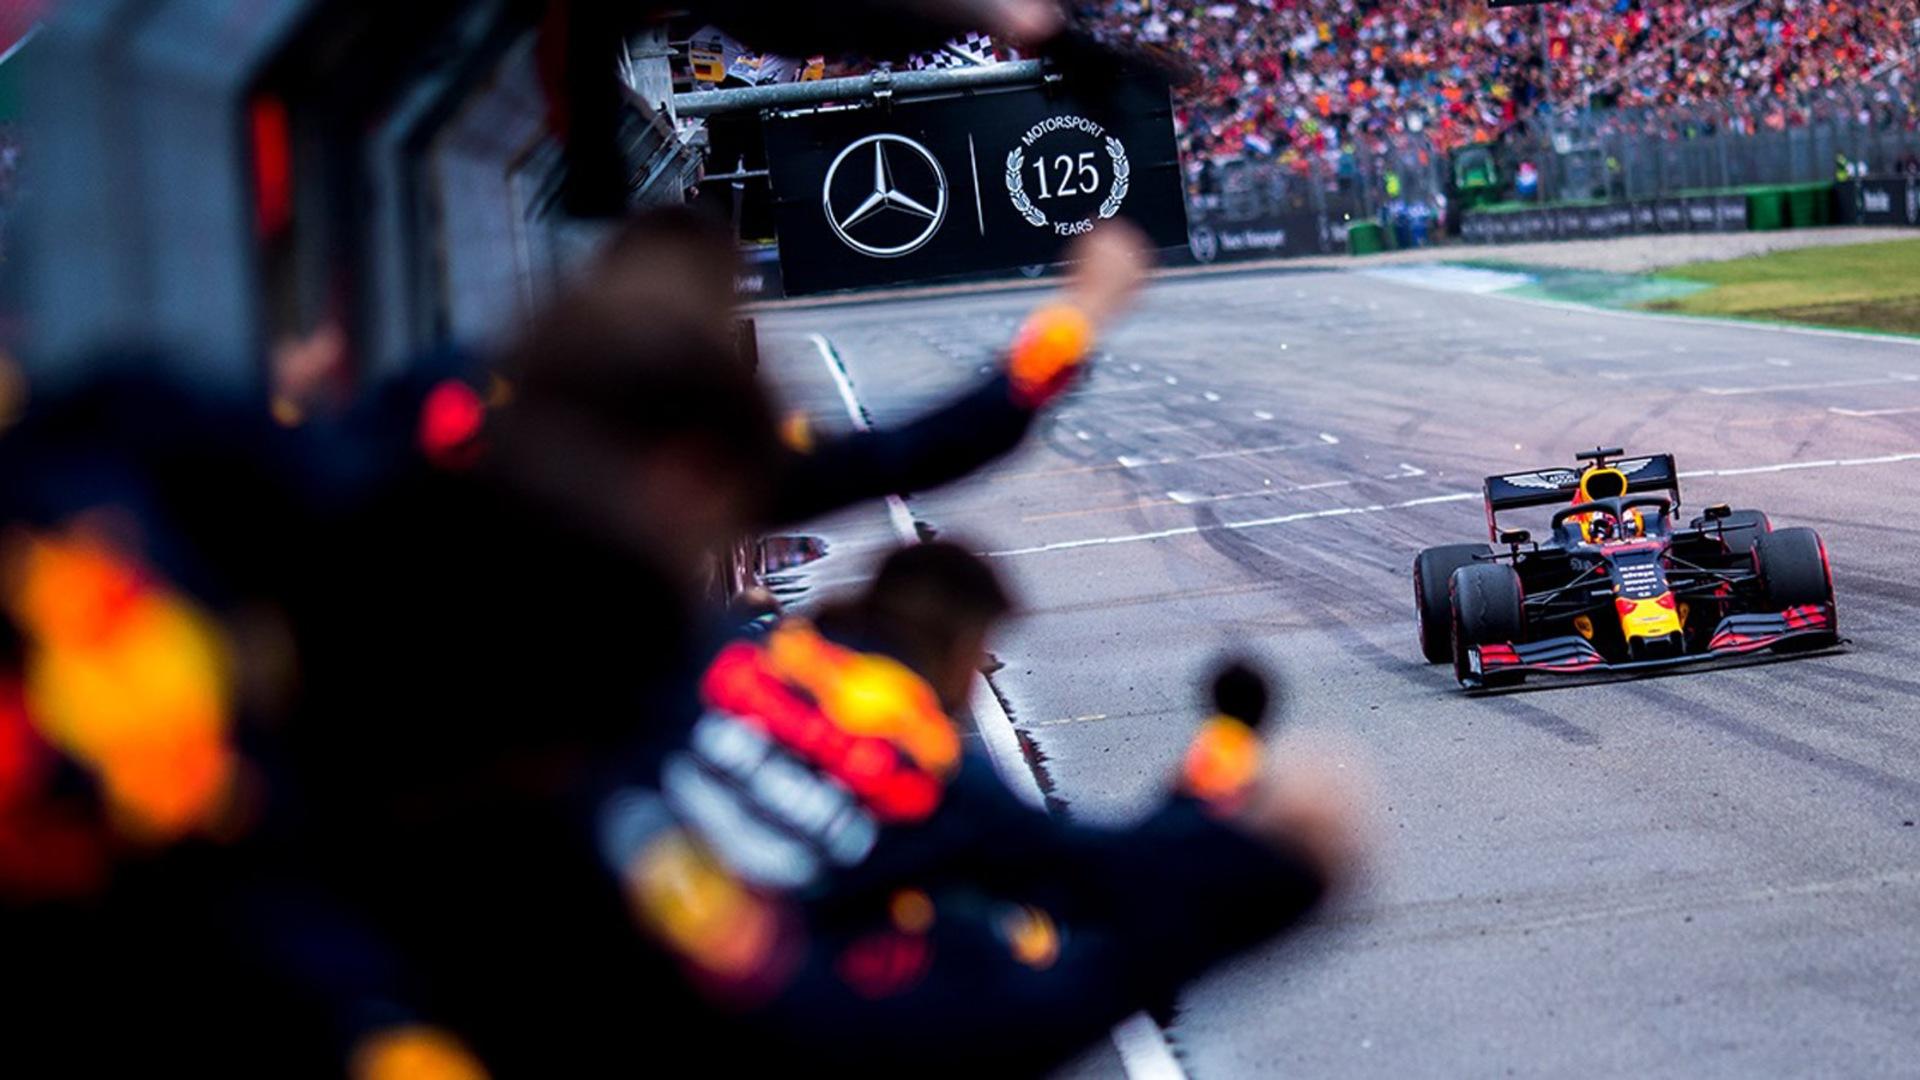 Aston Martin Red Bull Racings Max Verstappen At The 2019 Formula One German Grand Prix 100709891